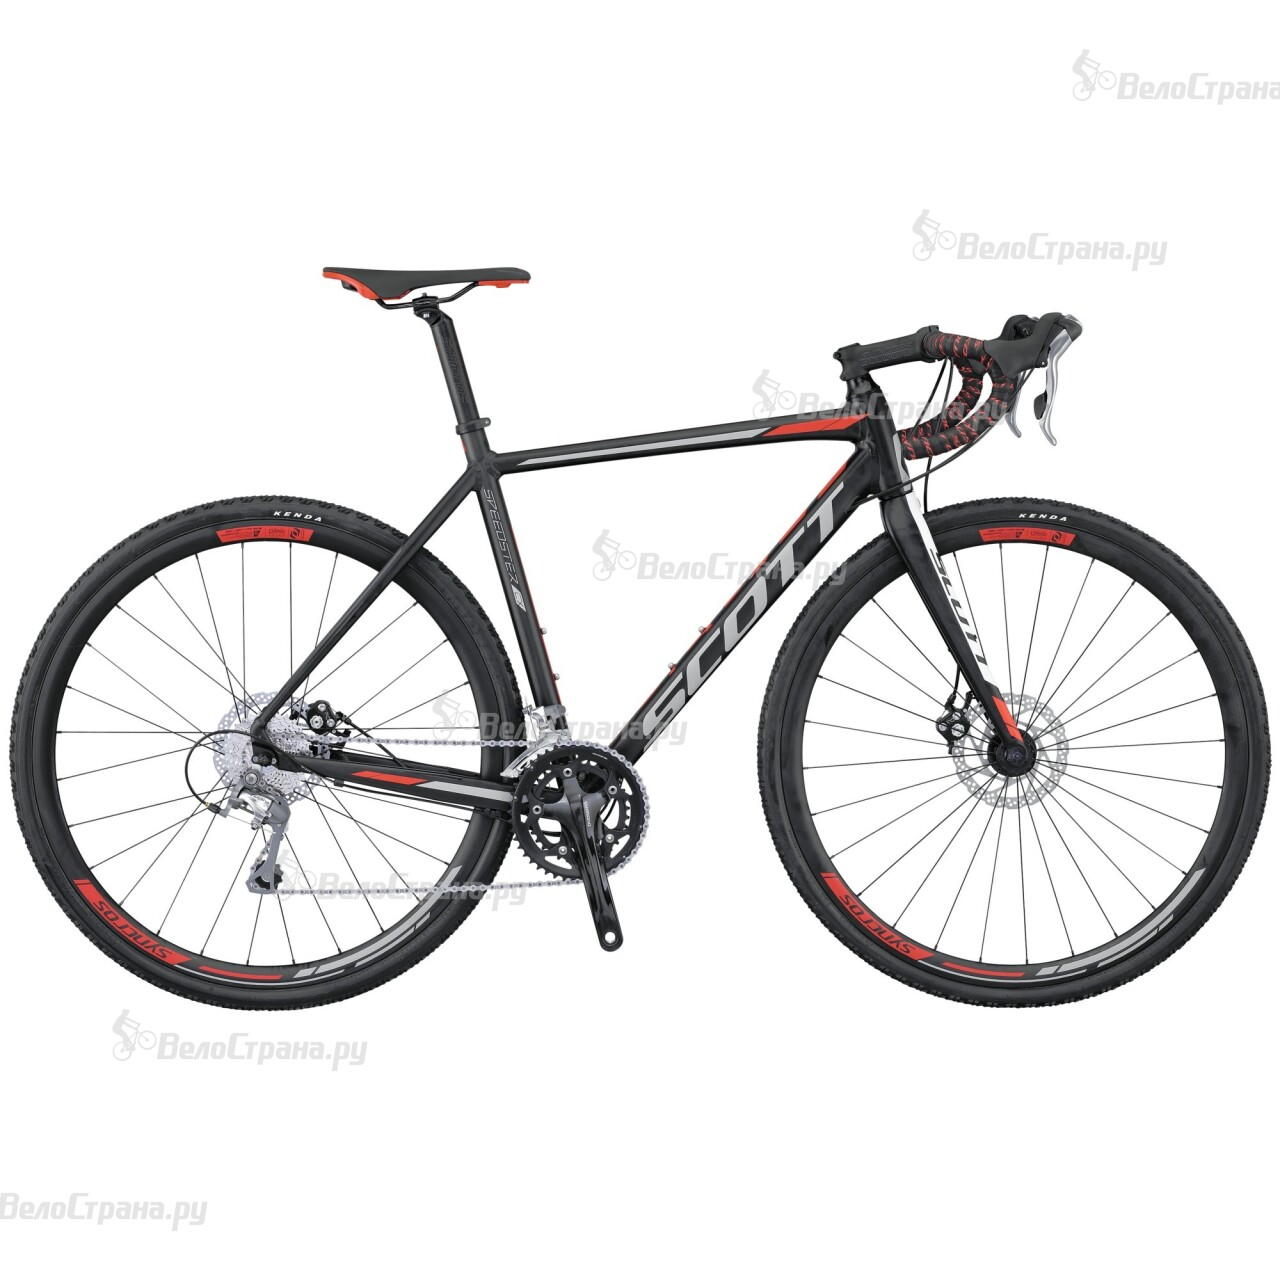 Велосипед Scott Speedster CX 20 Disc (2016) велосипед scott speedster cx 20 disc 28 2016